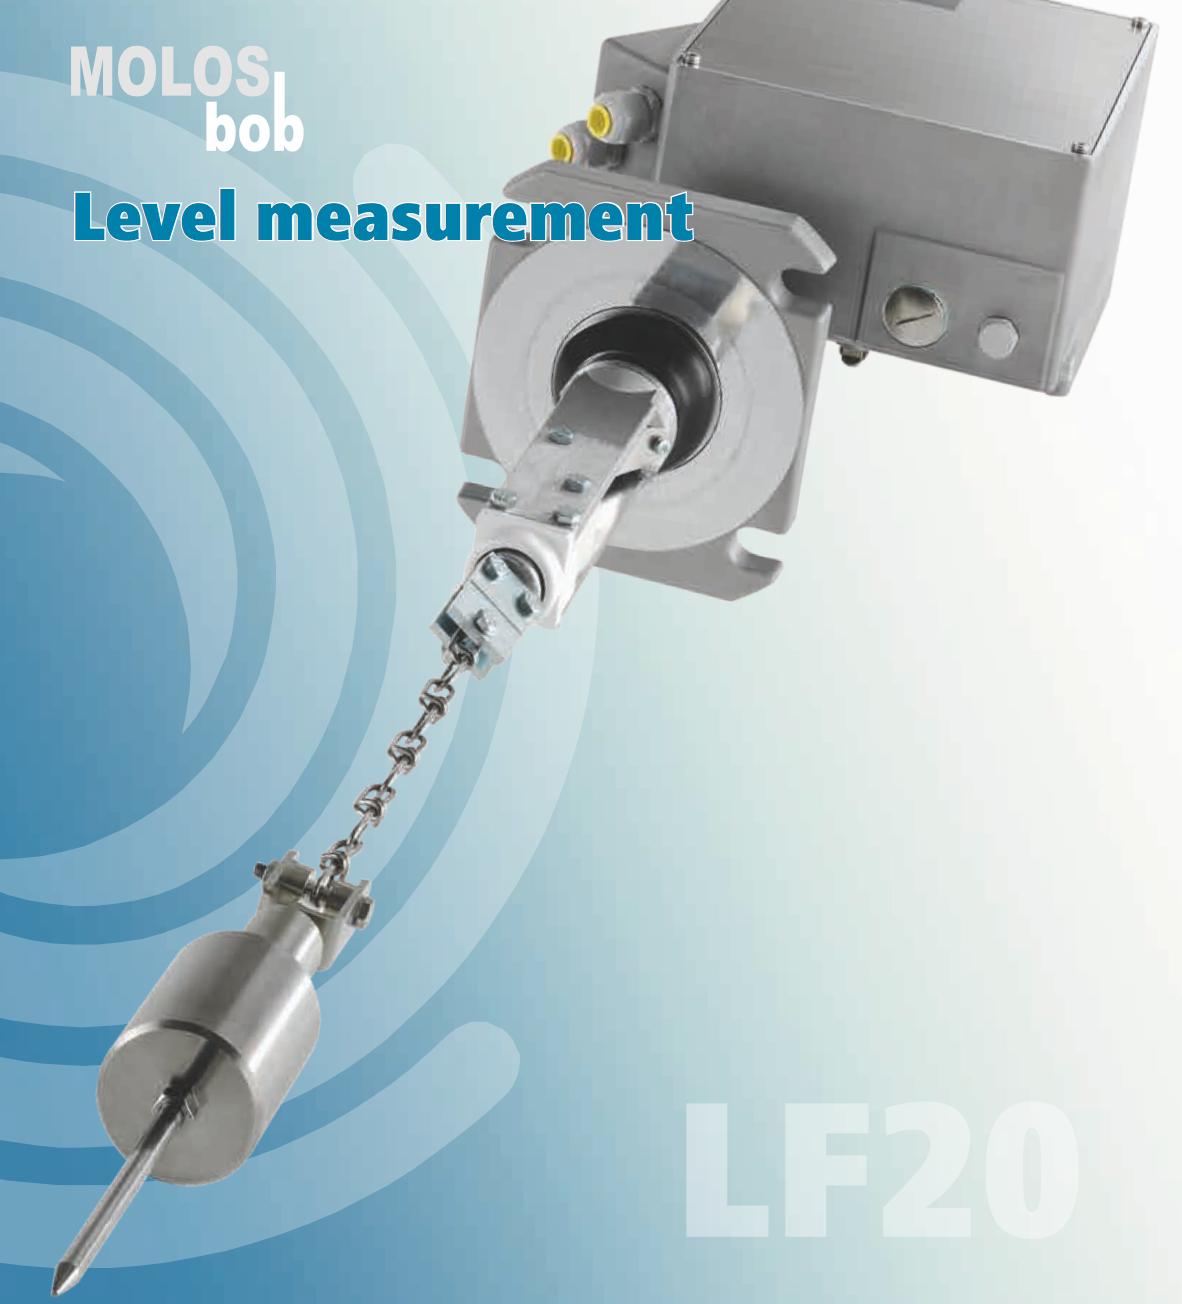 cảm biến đo mức chất rắn mollet LF20